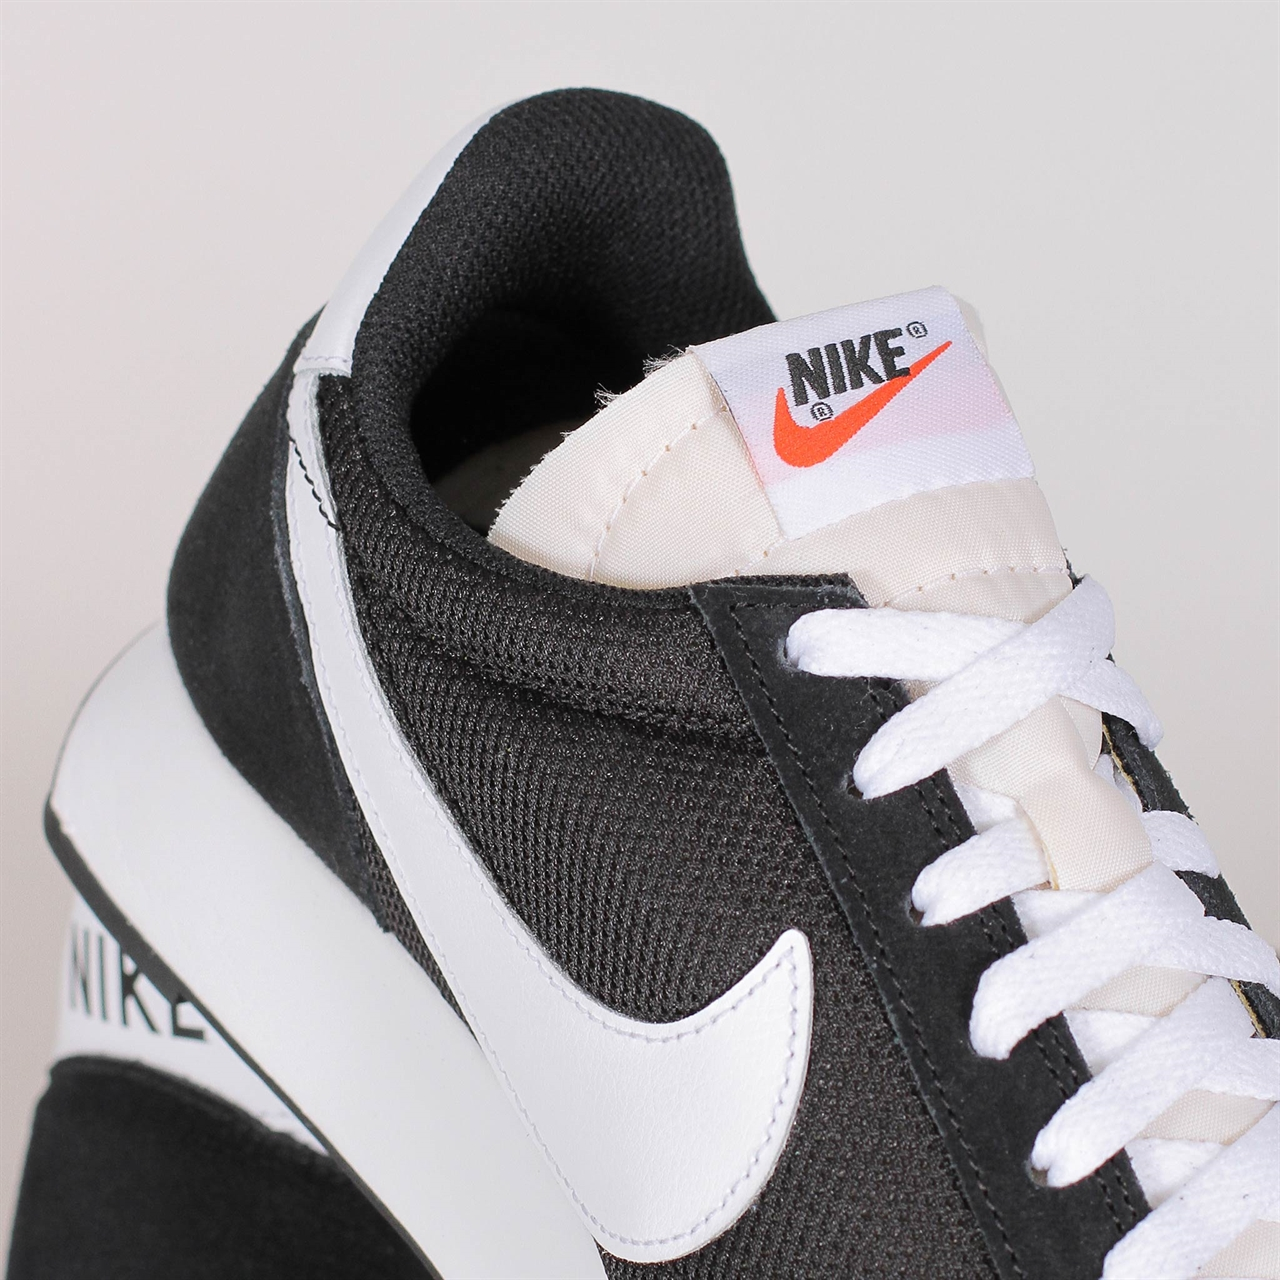 6f7d91dab56265 Shelta - Nike Air Tailwind 79 (487754-009)